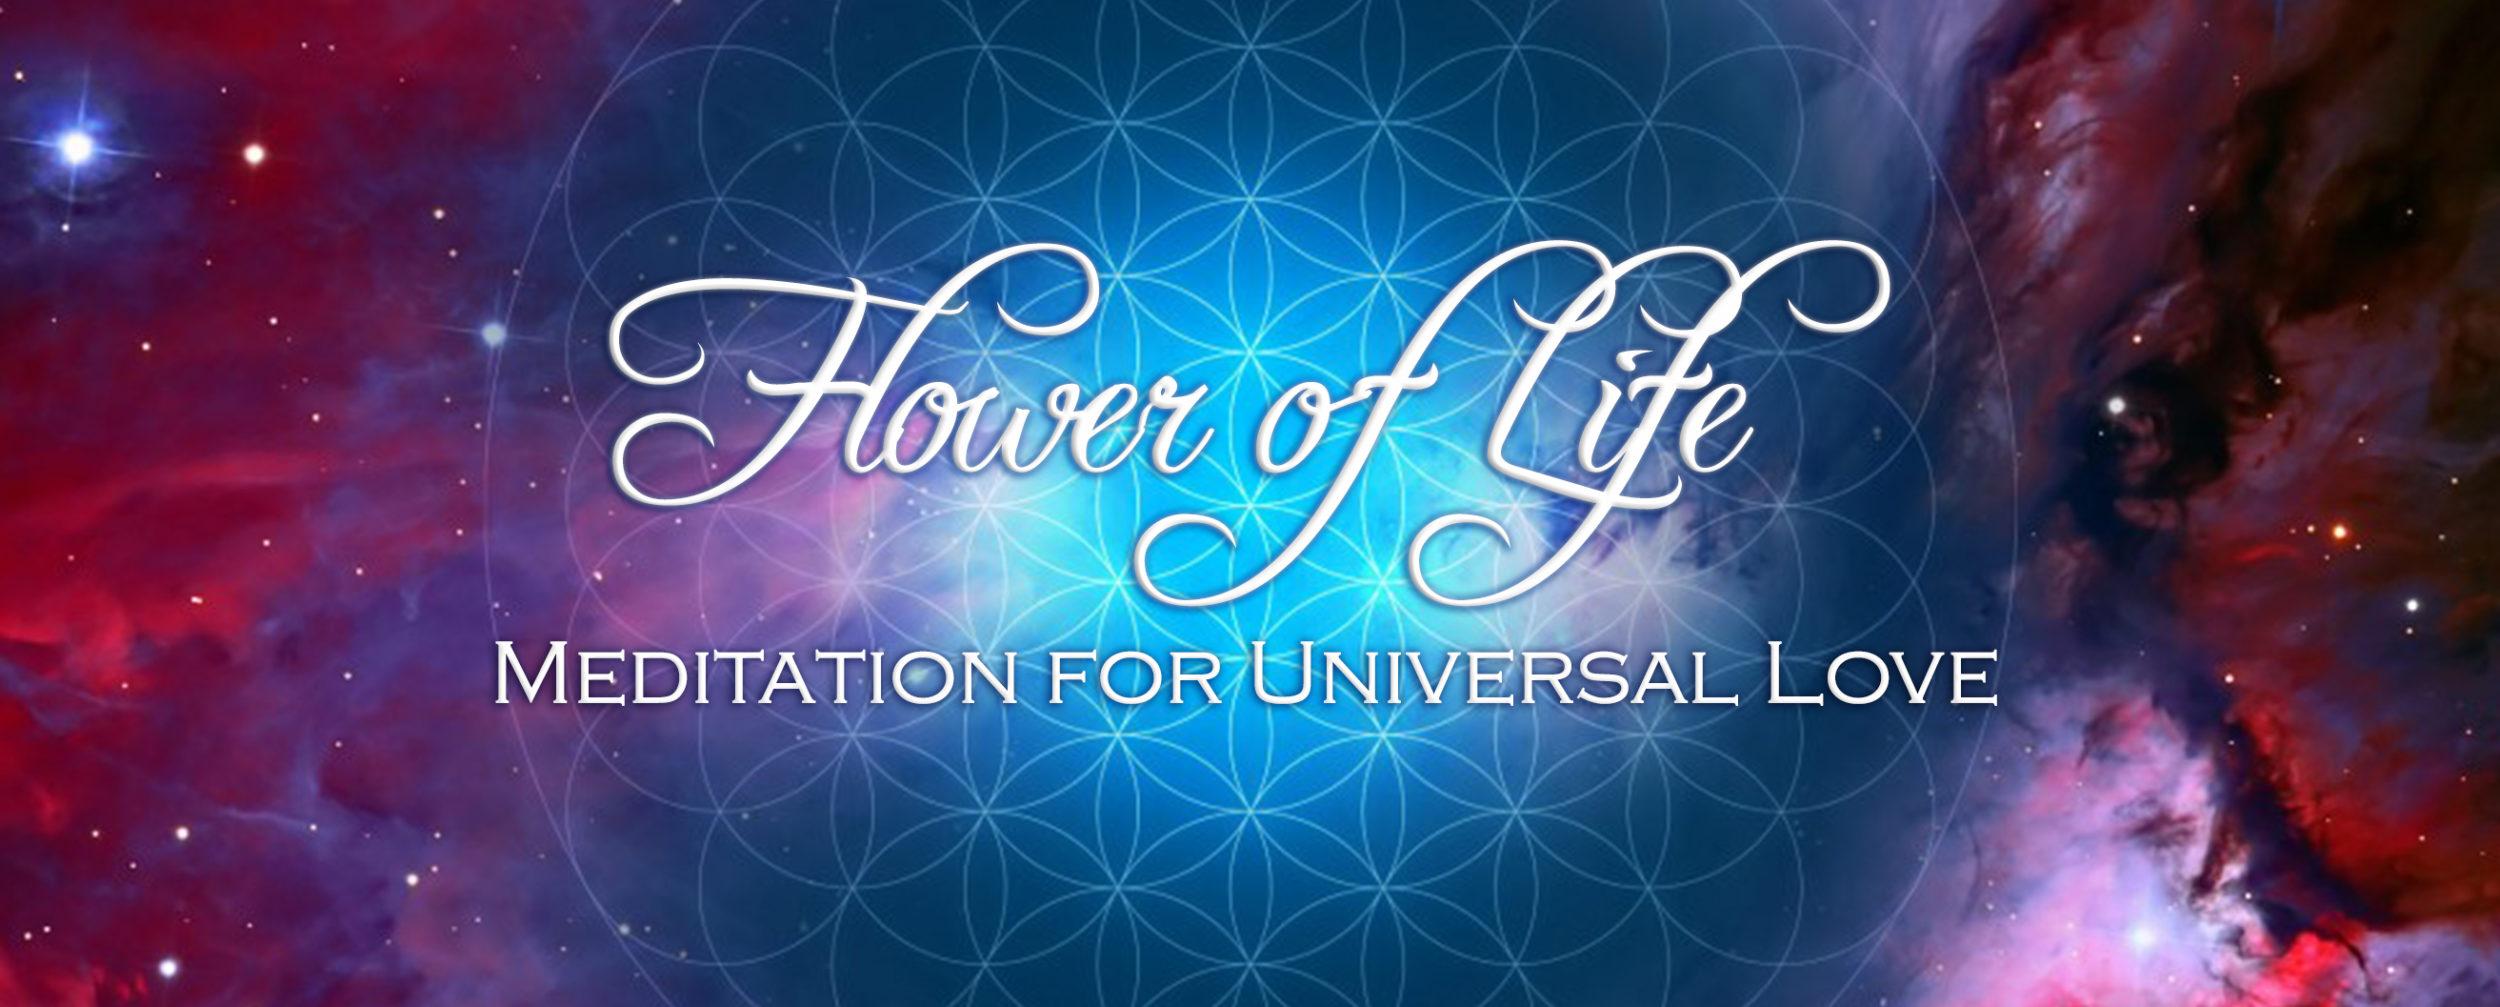 floweroflife_meditation